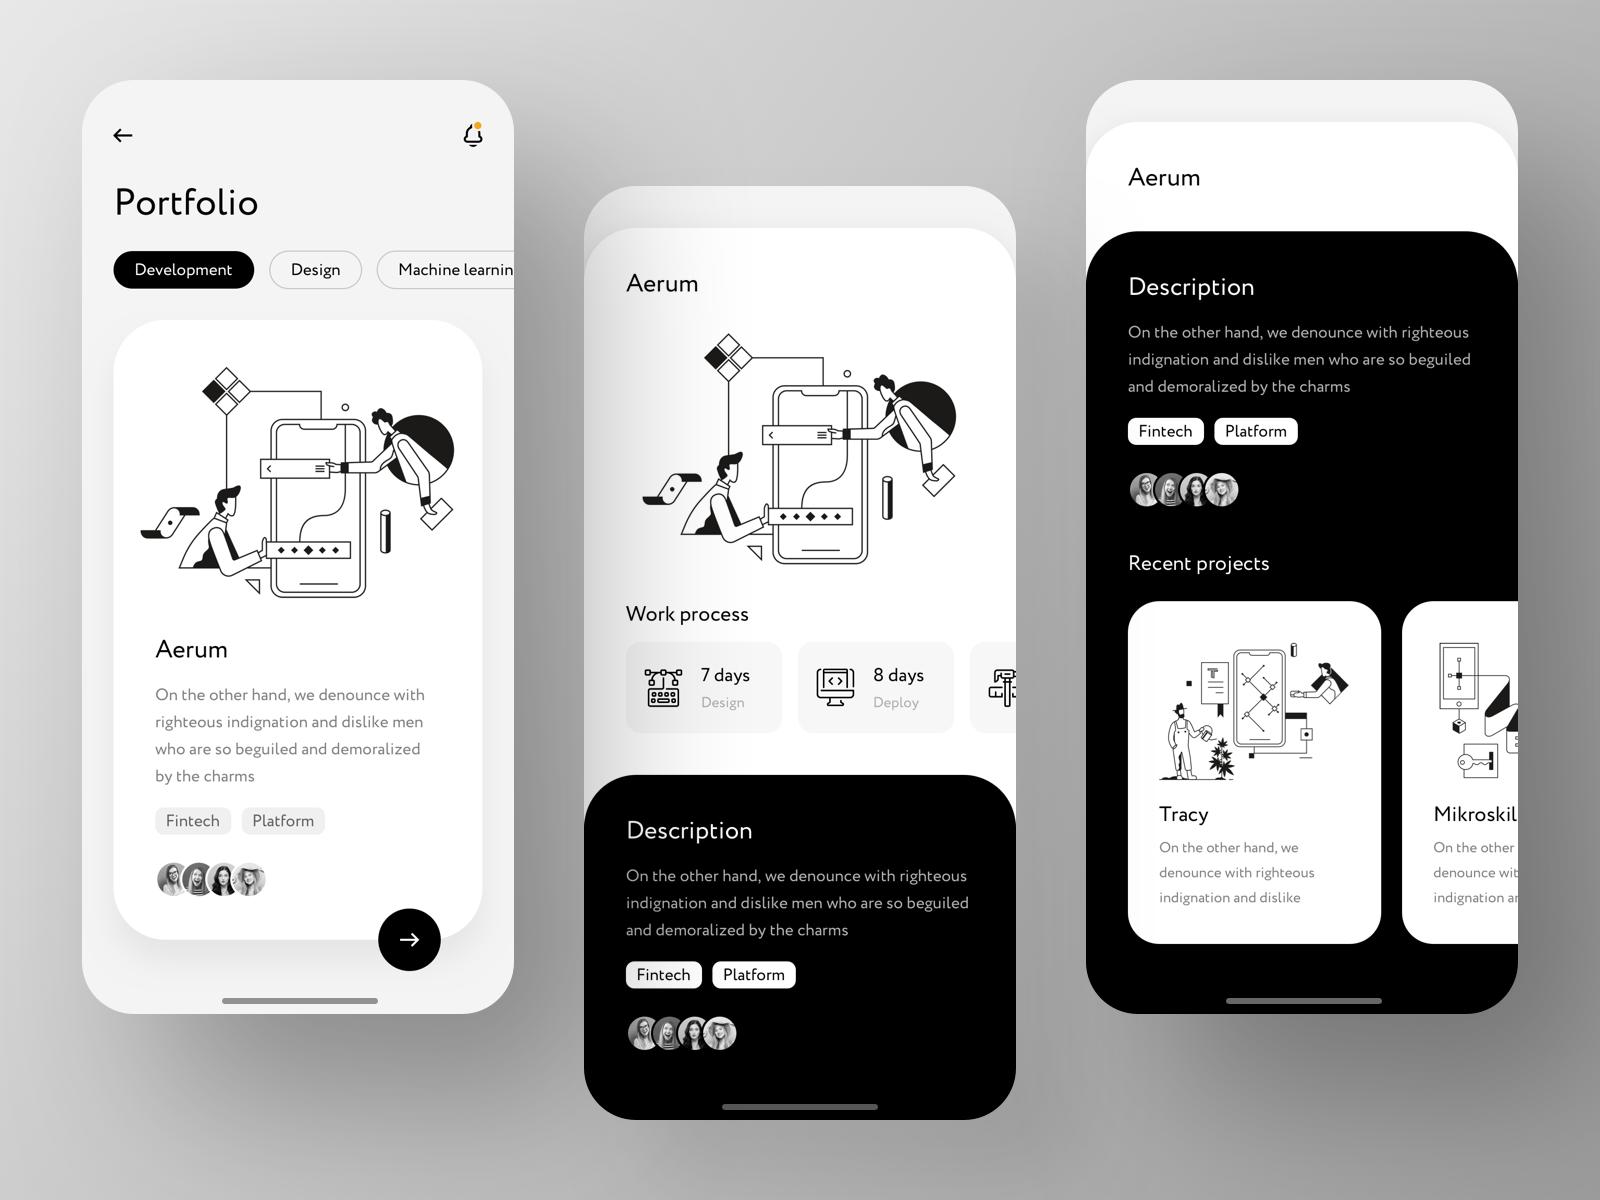 Exyte Mobile App Case Study in 2020 Mobile app, User